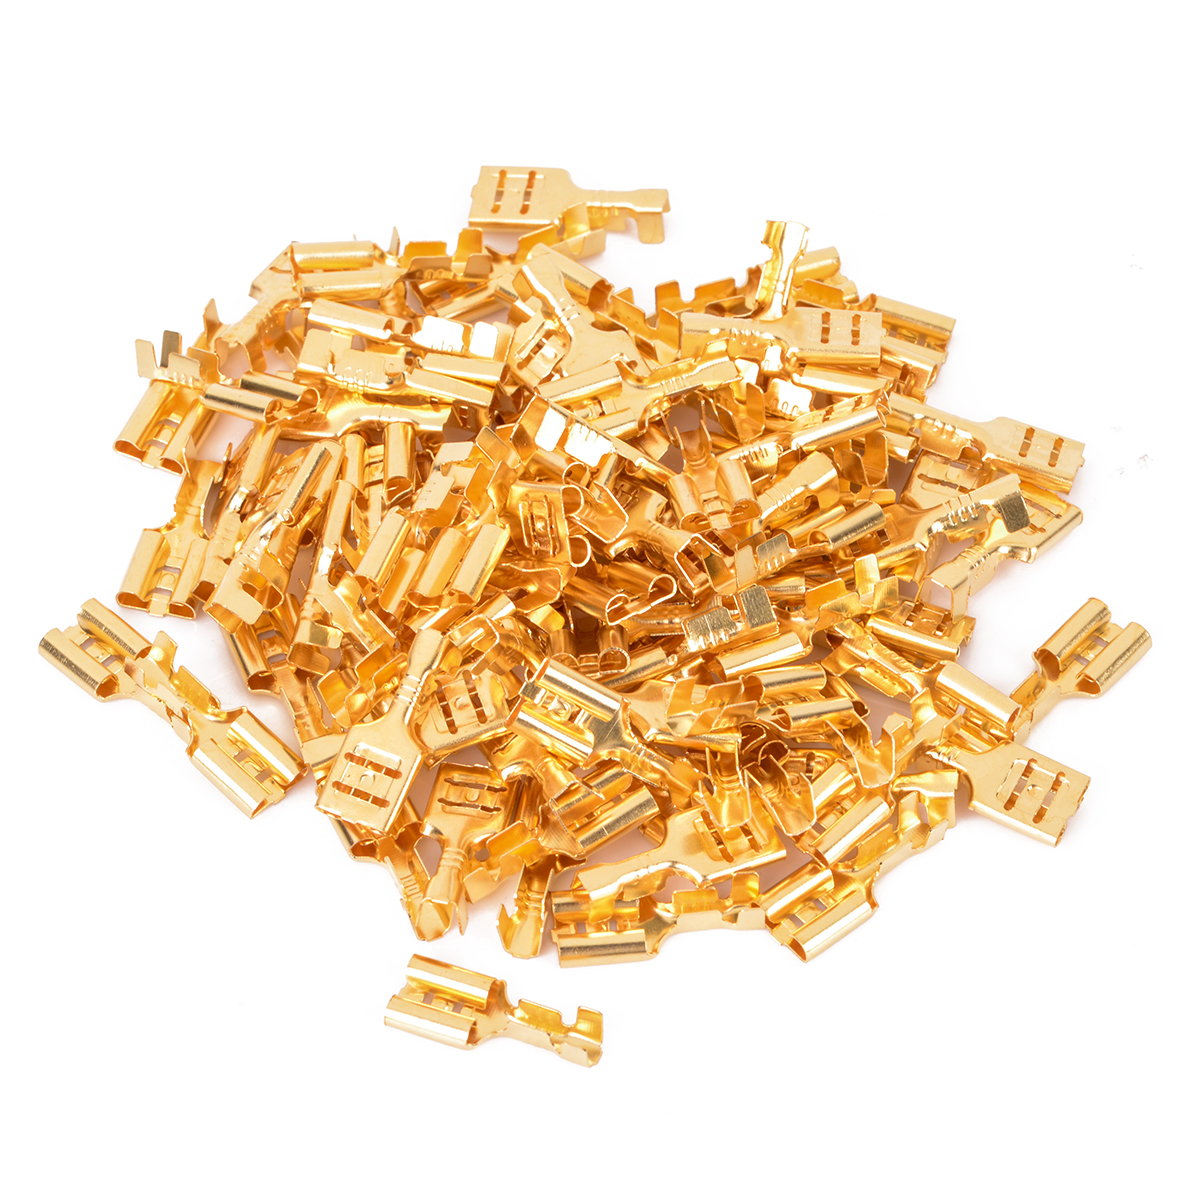 100 Pcs Gold Brass Car Speaker Female Spade Terminal Wire Connector 6.3mm ZP